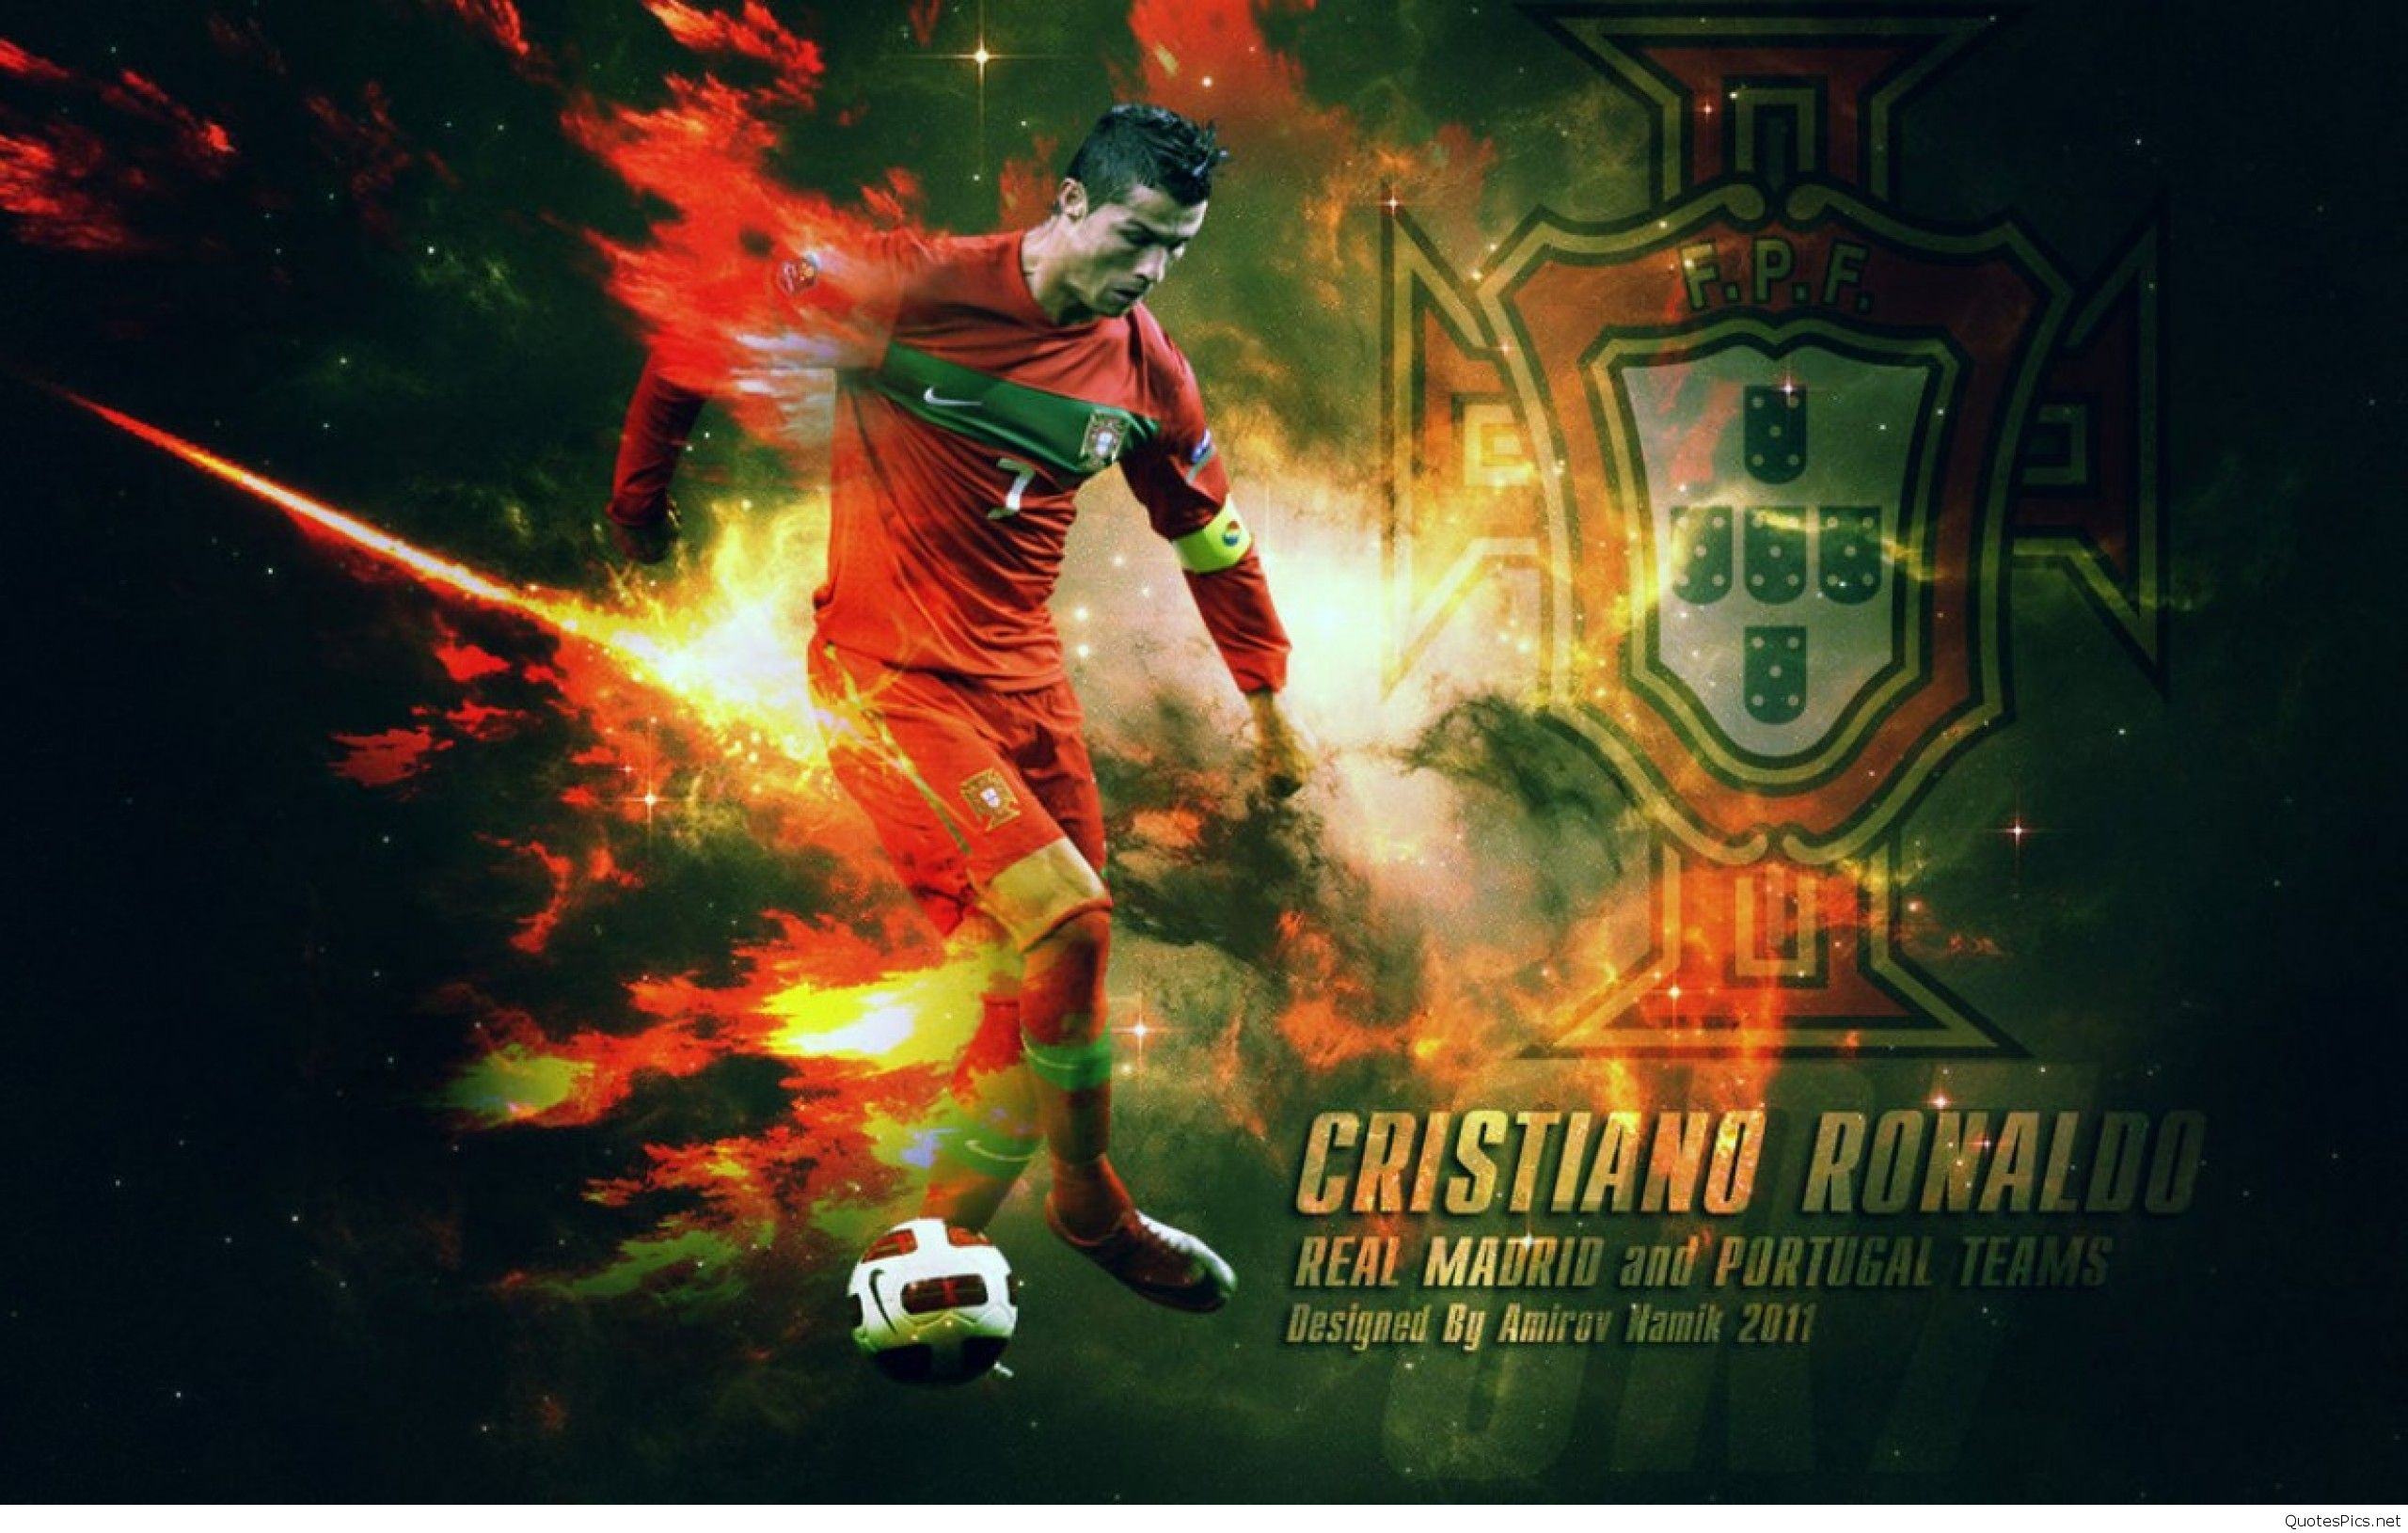 Euro 2016 wallpaper backgrounds hd 2560x1630